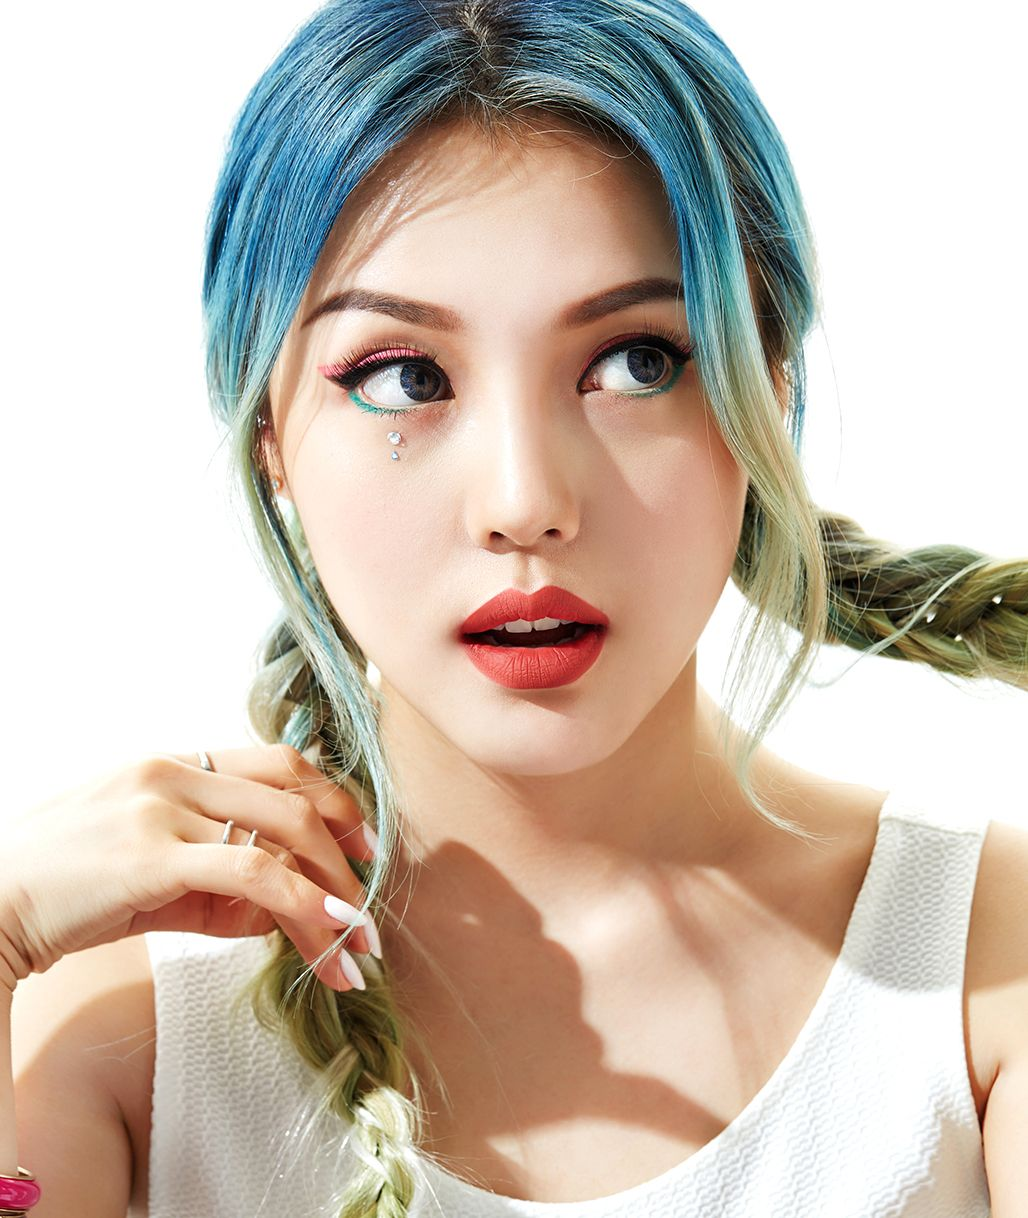 Korean Natural Eyebrow Tutorial by Liah Yoo Ideias de